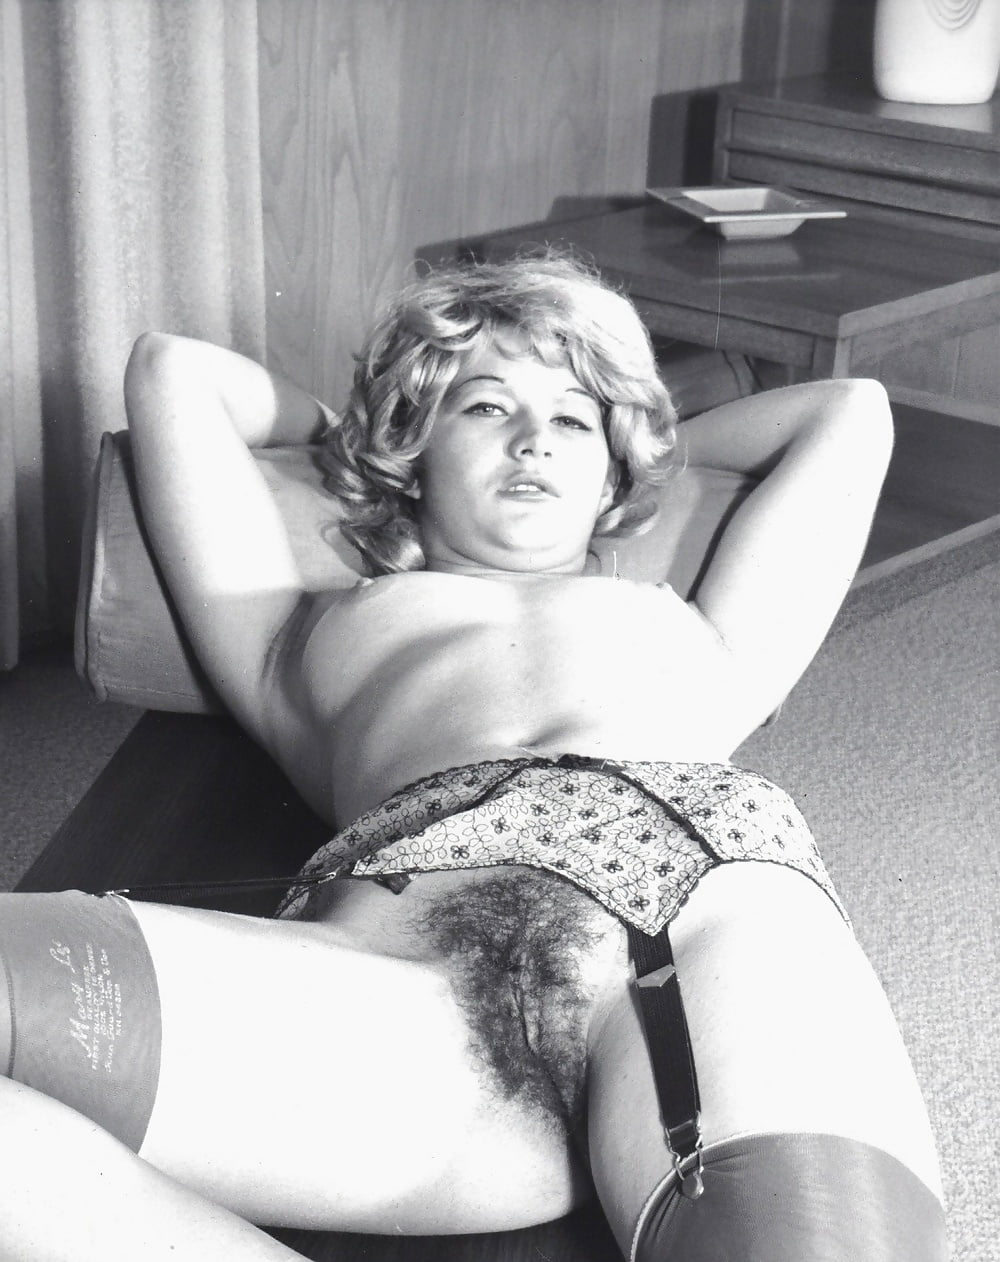 Vintage hairy mature lady pics — 15